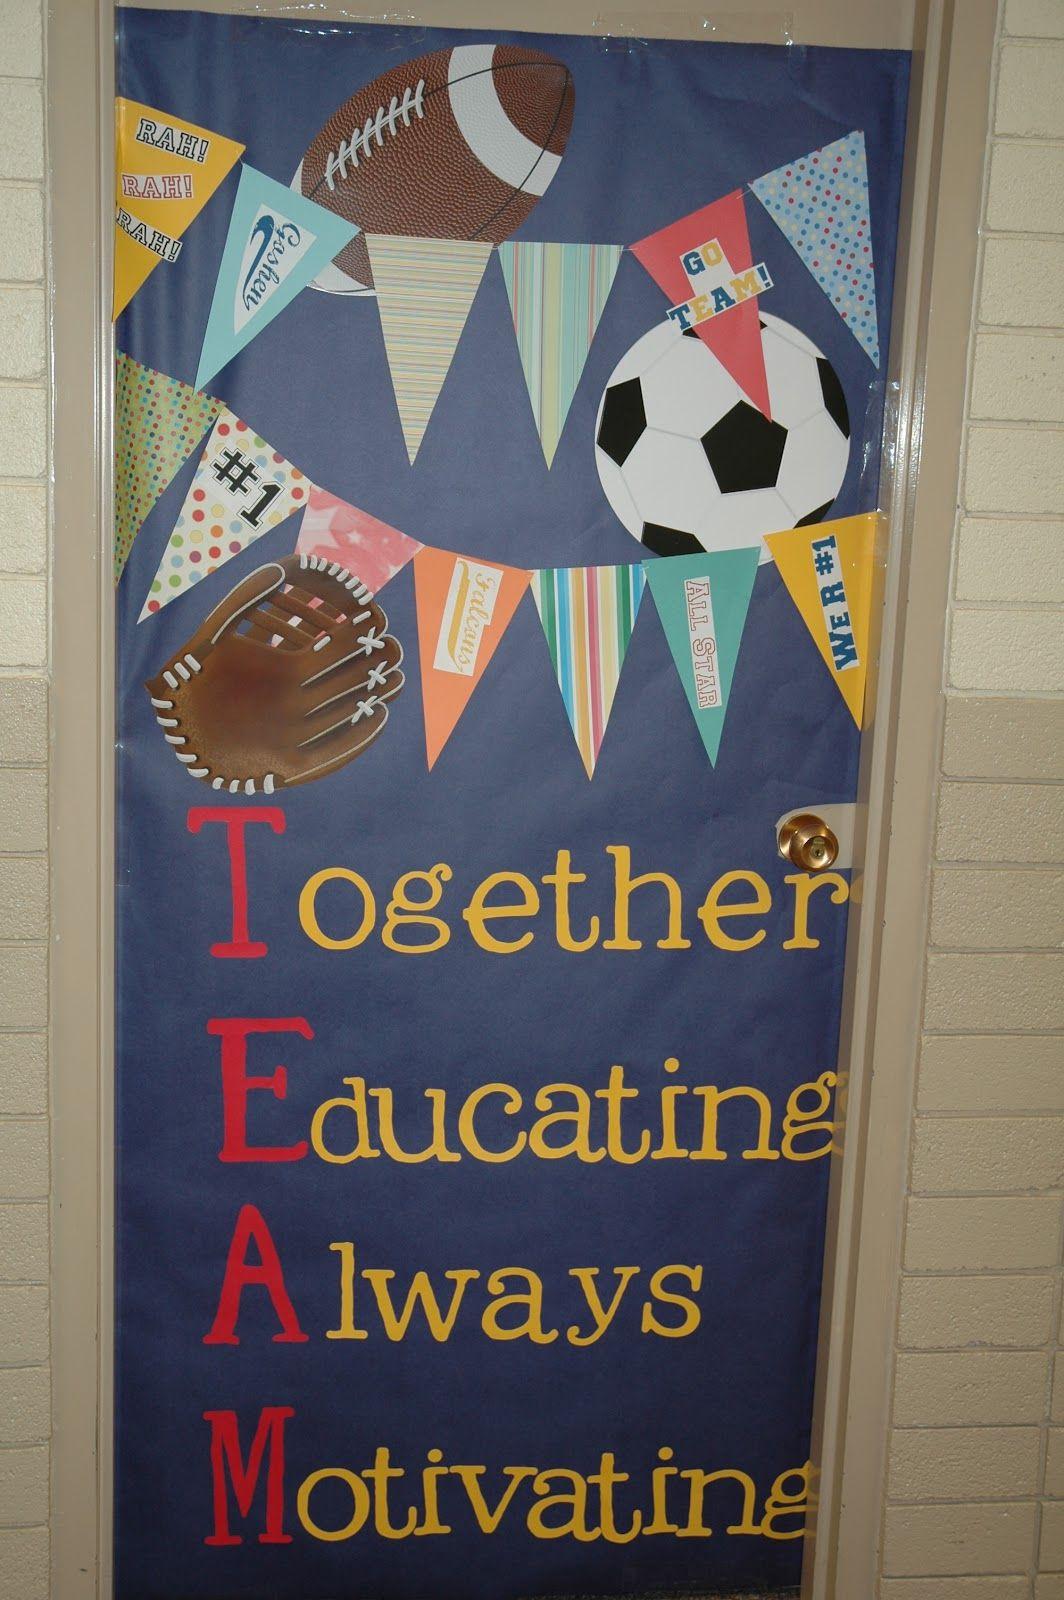 Classroom Door Decoration Teacher Appreciation Week : Teacher appreciation door decorating ideas